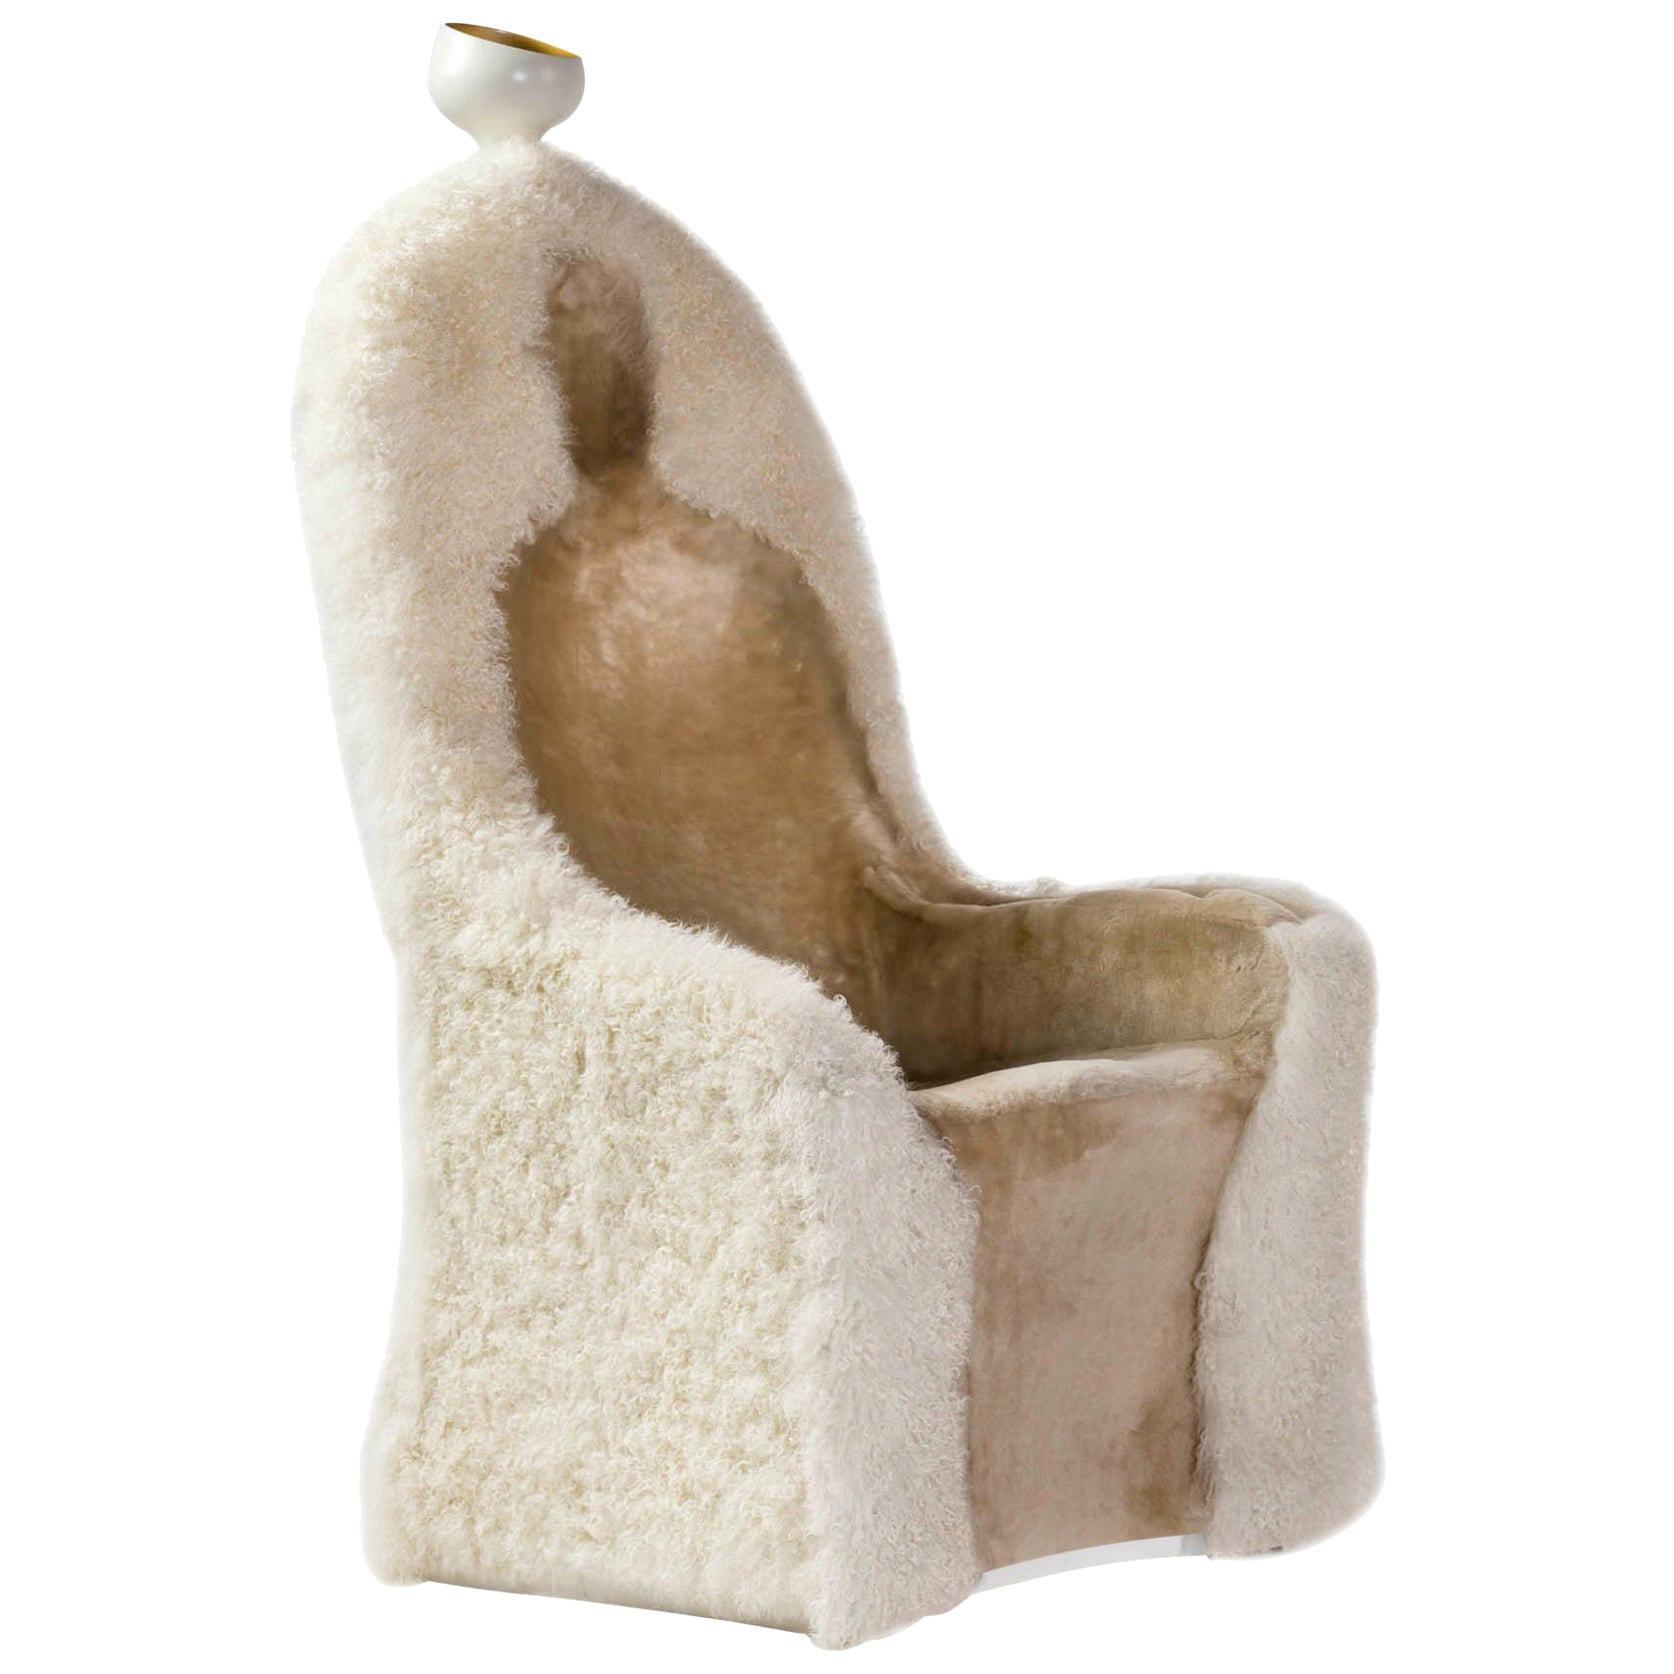 Salvador Dali, Contemporary, Limited Edition 'Invisible Personage' Armchair